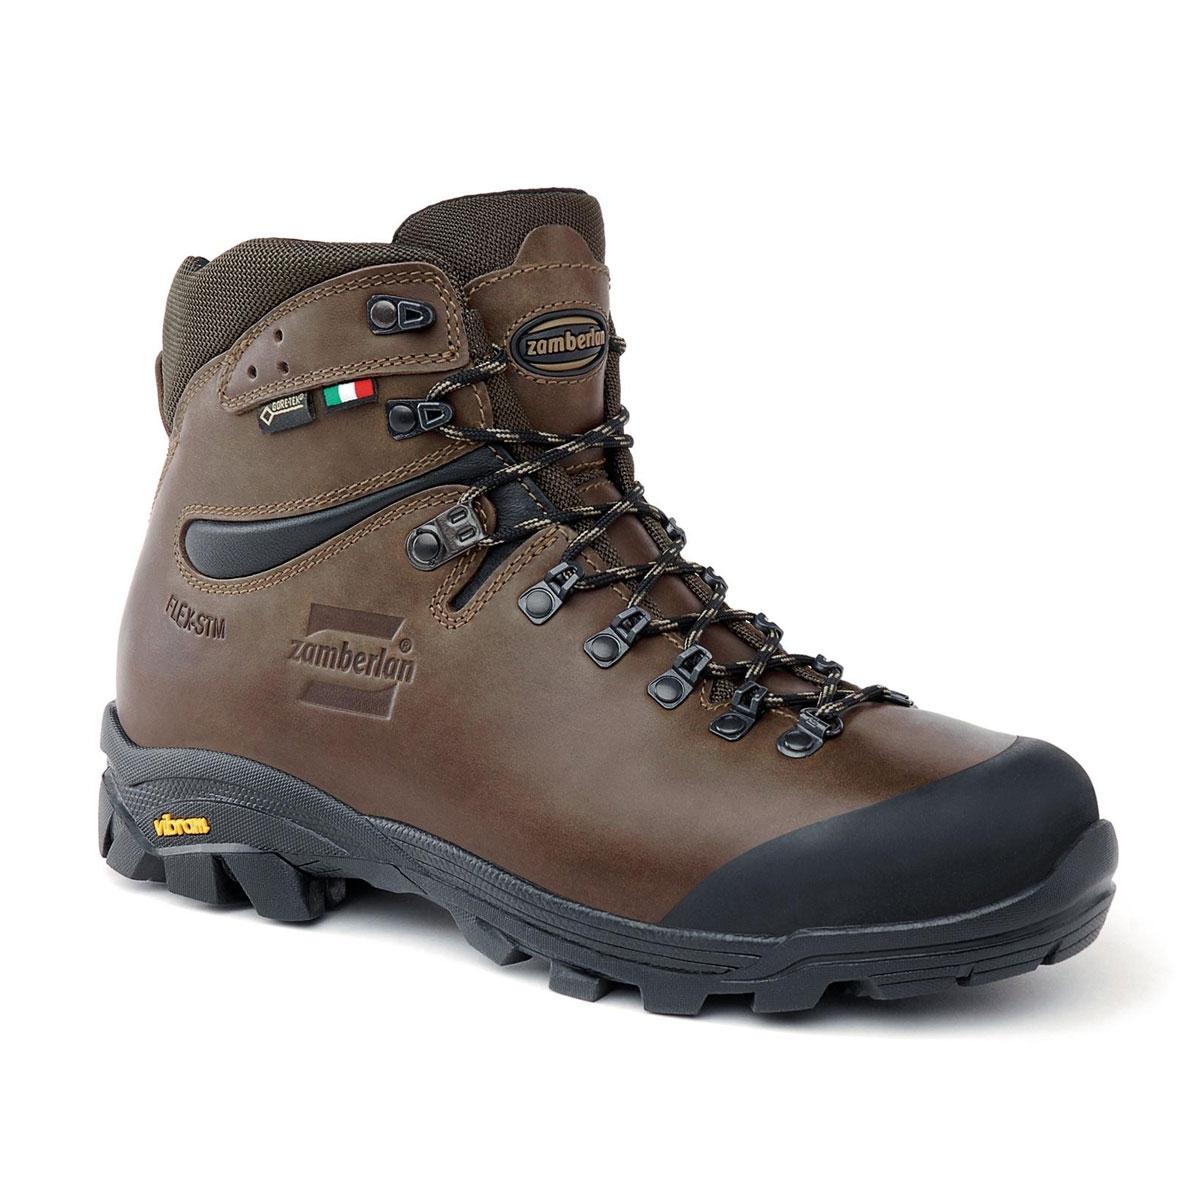 460c3a45fb3 Zamberlan 1007 Vioz Hunt GTX RR Walking Boots (Men's) - Waxed Chestnut